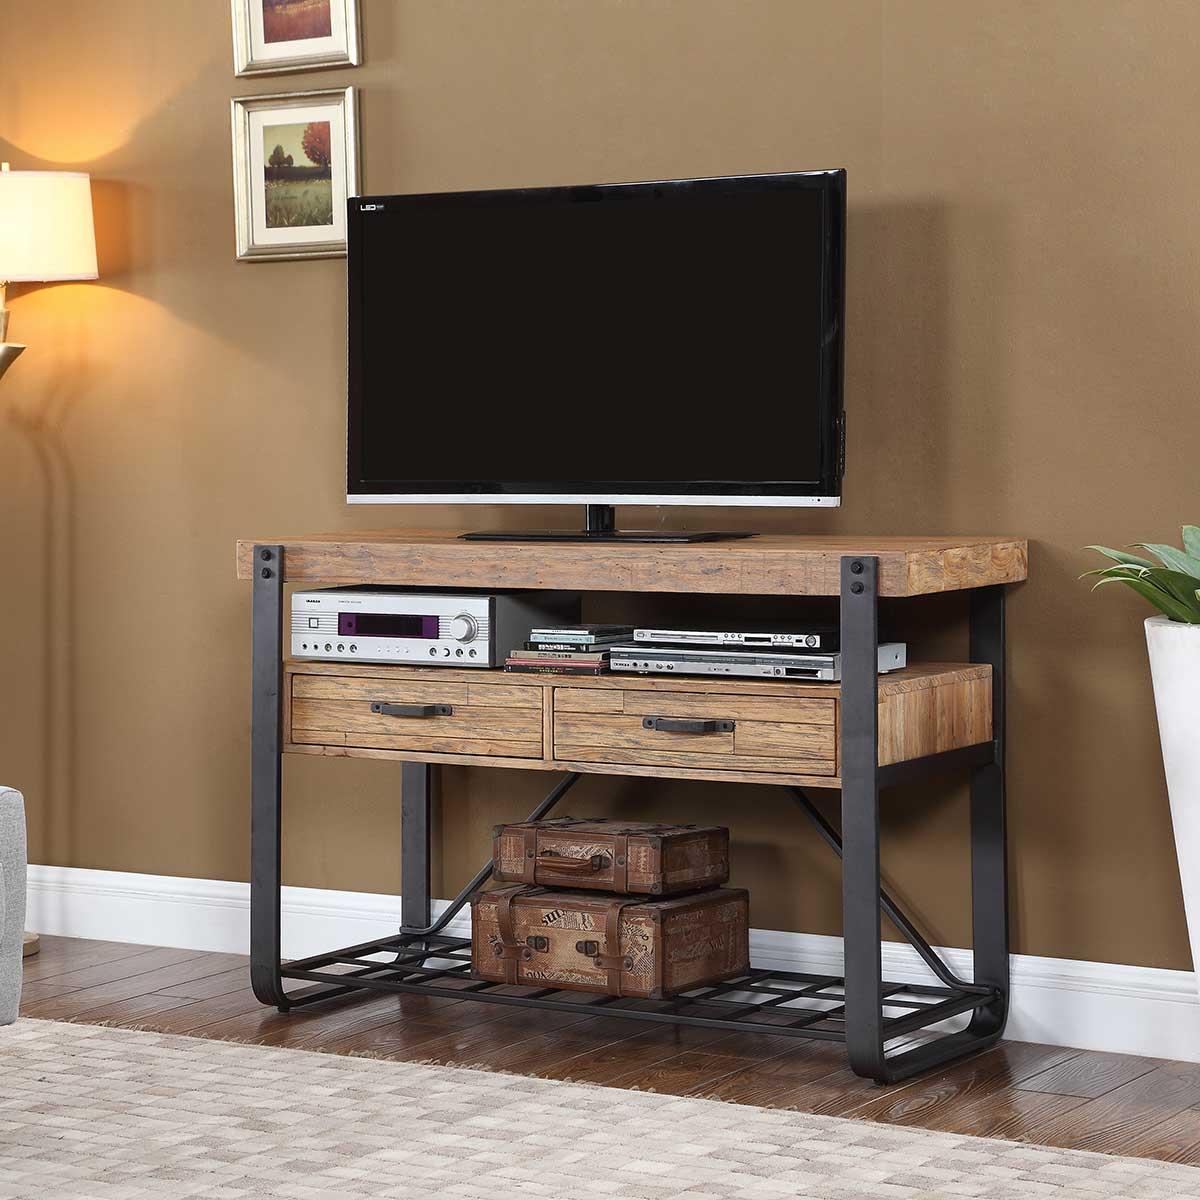 1668O%2077789ec43e38427eb38462e6ad24fe3d/1668O--TV-stand---TV-Console-(2).jpg